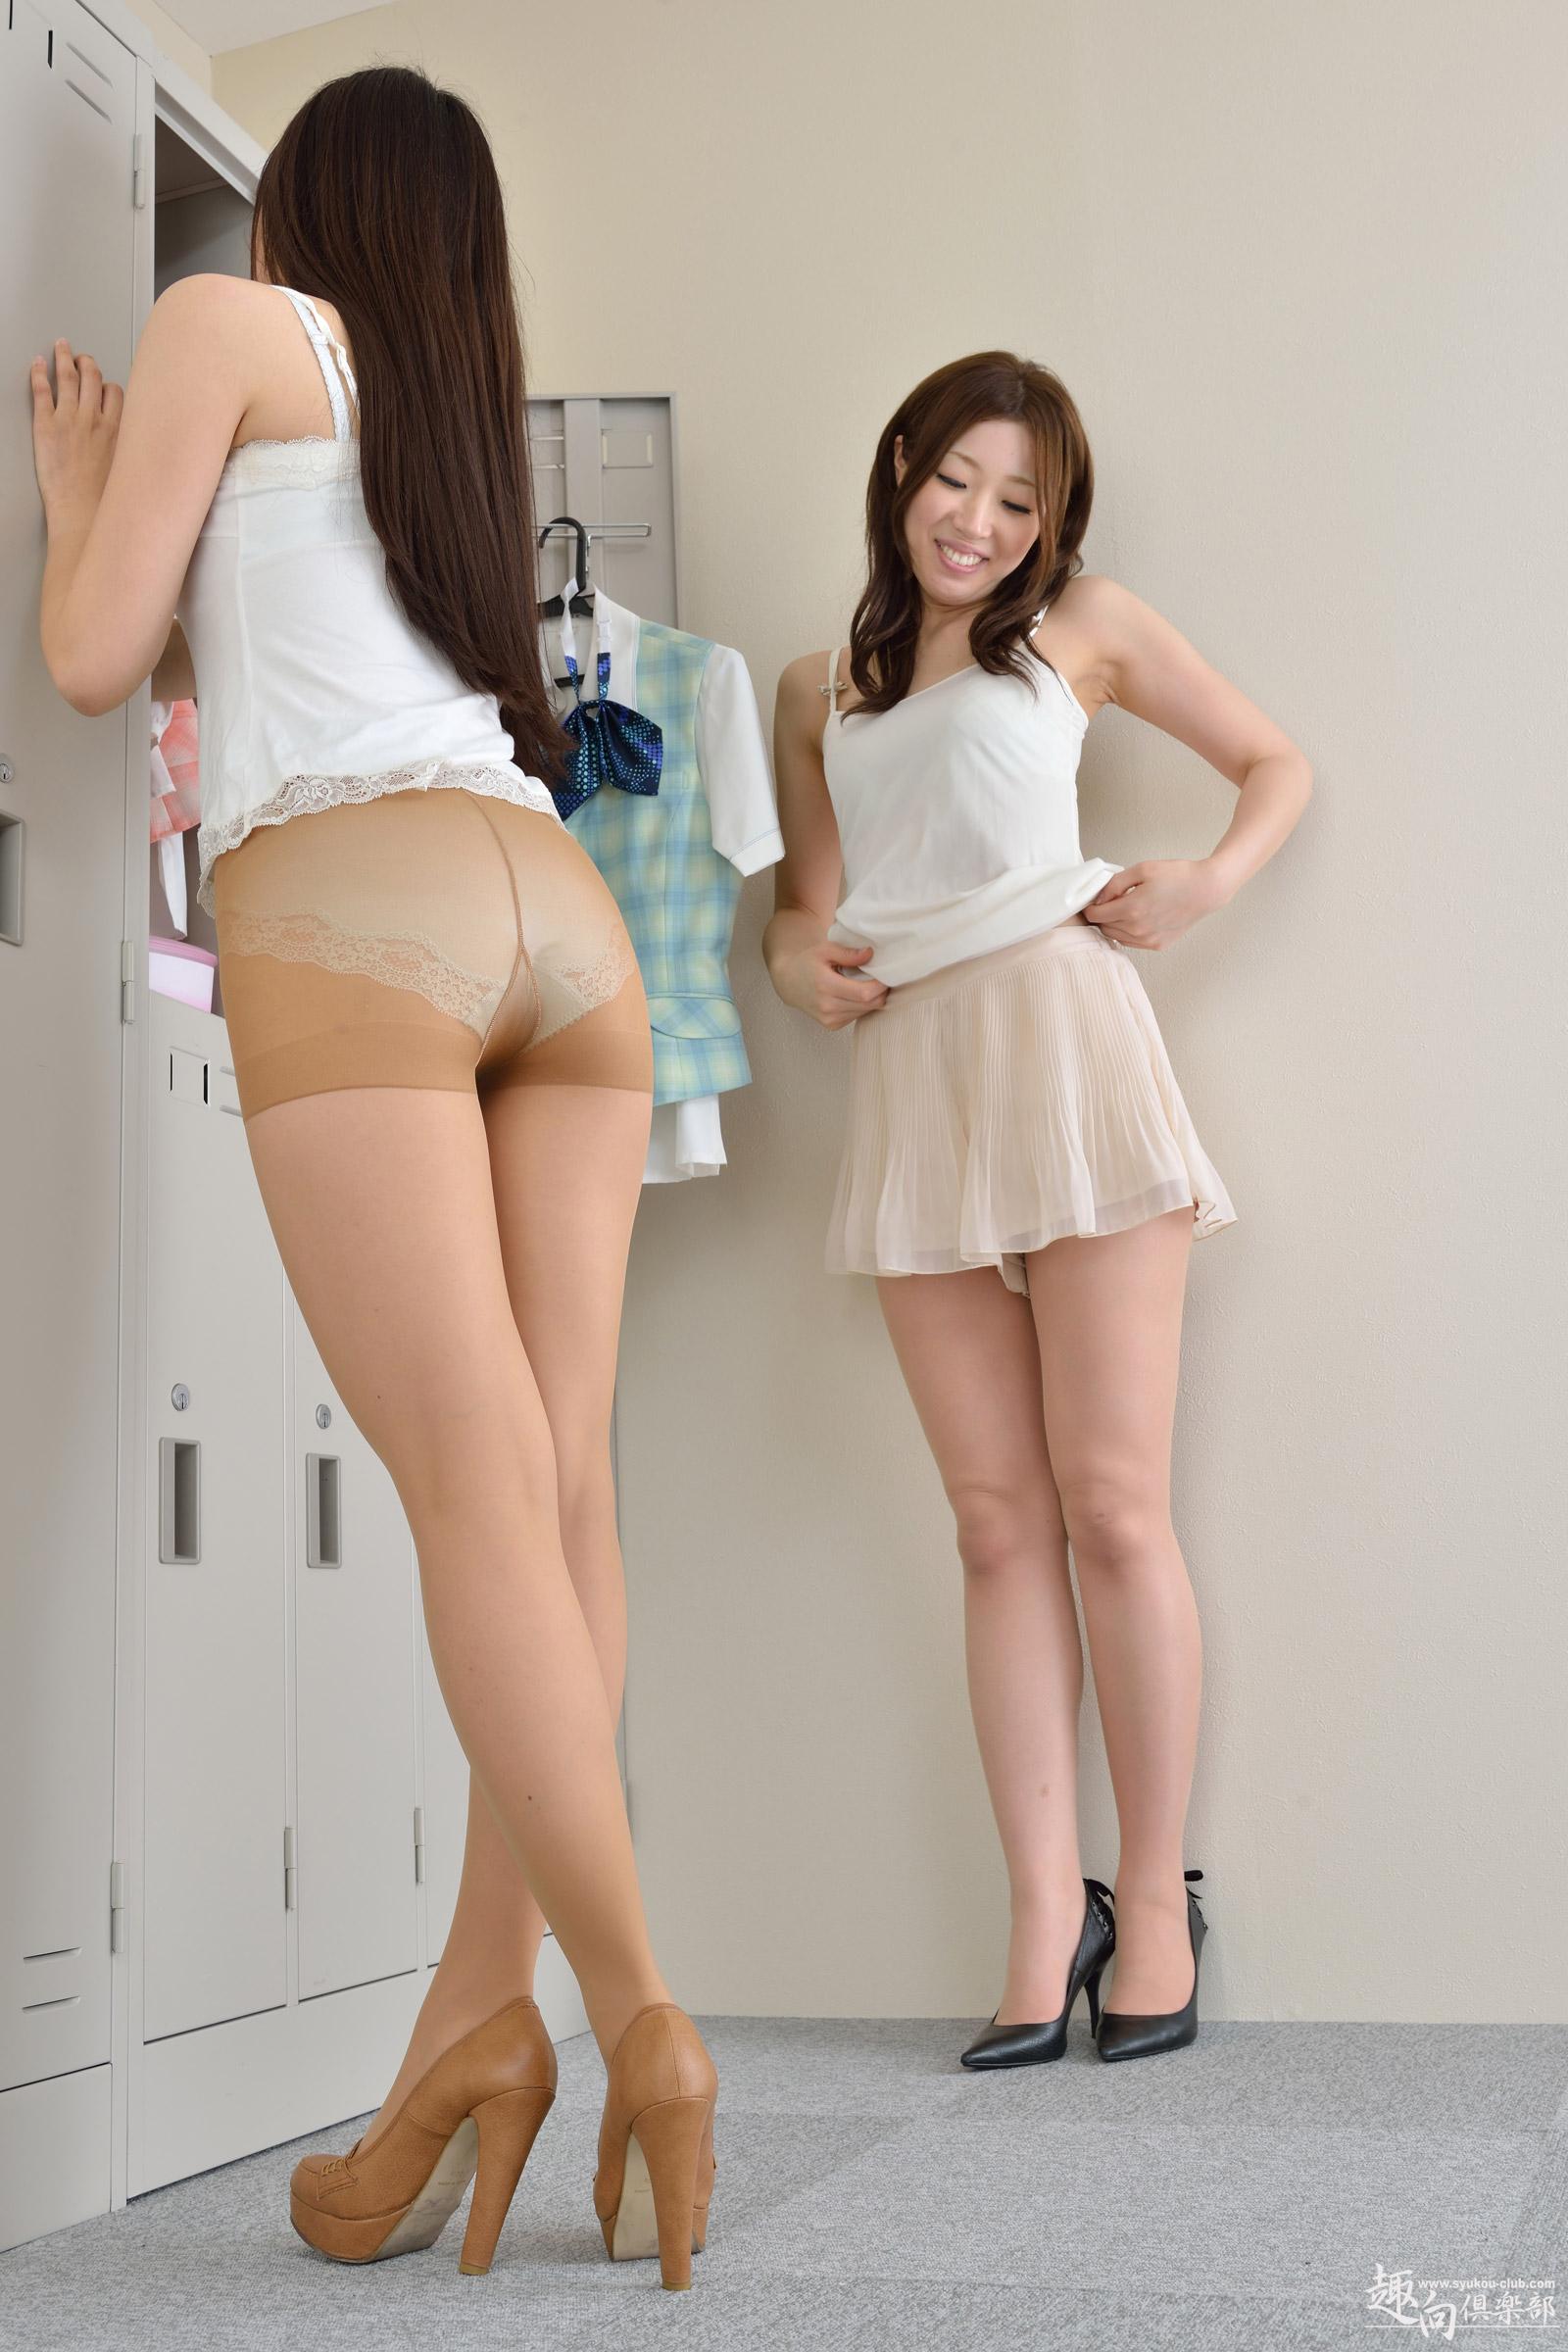 People 1600x2400 women model brunette long hair Asian portrait display pantyhose high heels smiling miniskirt ass lockers tank top Asuka Ichinose